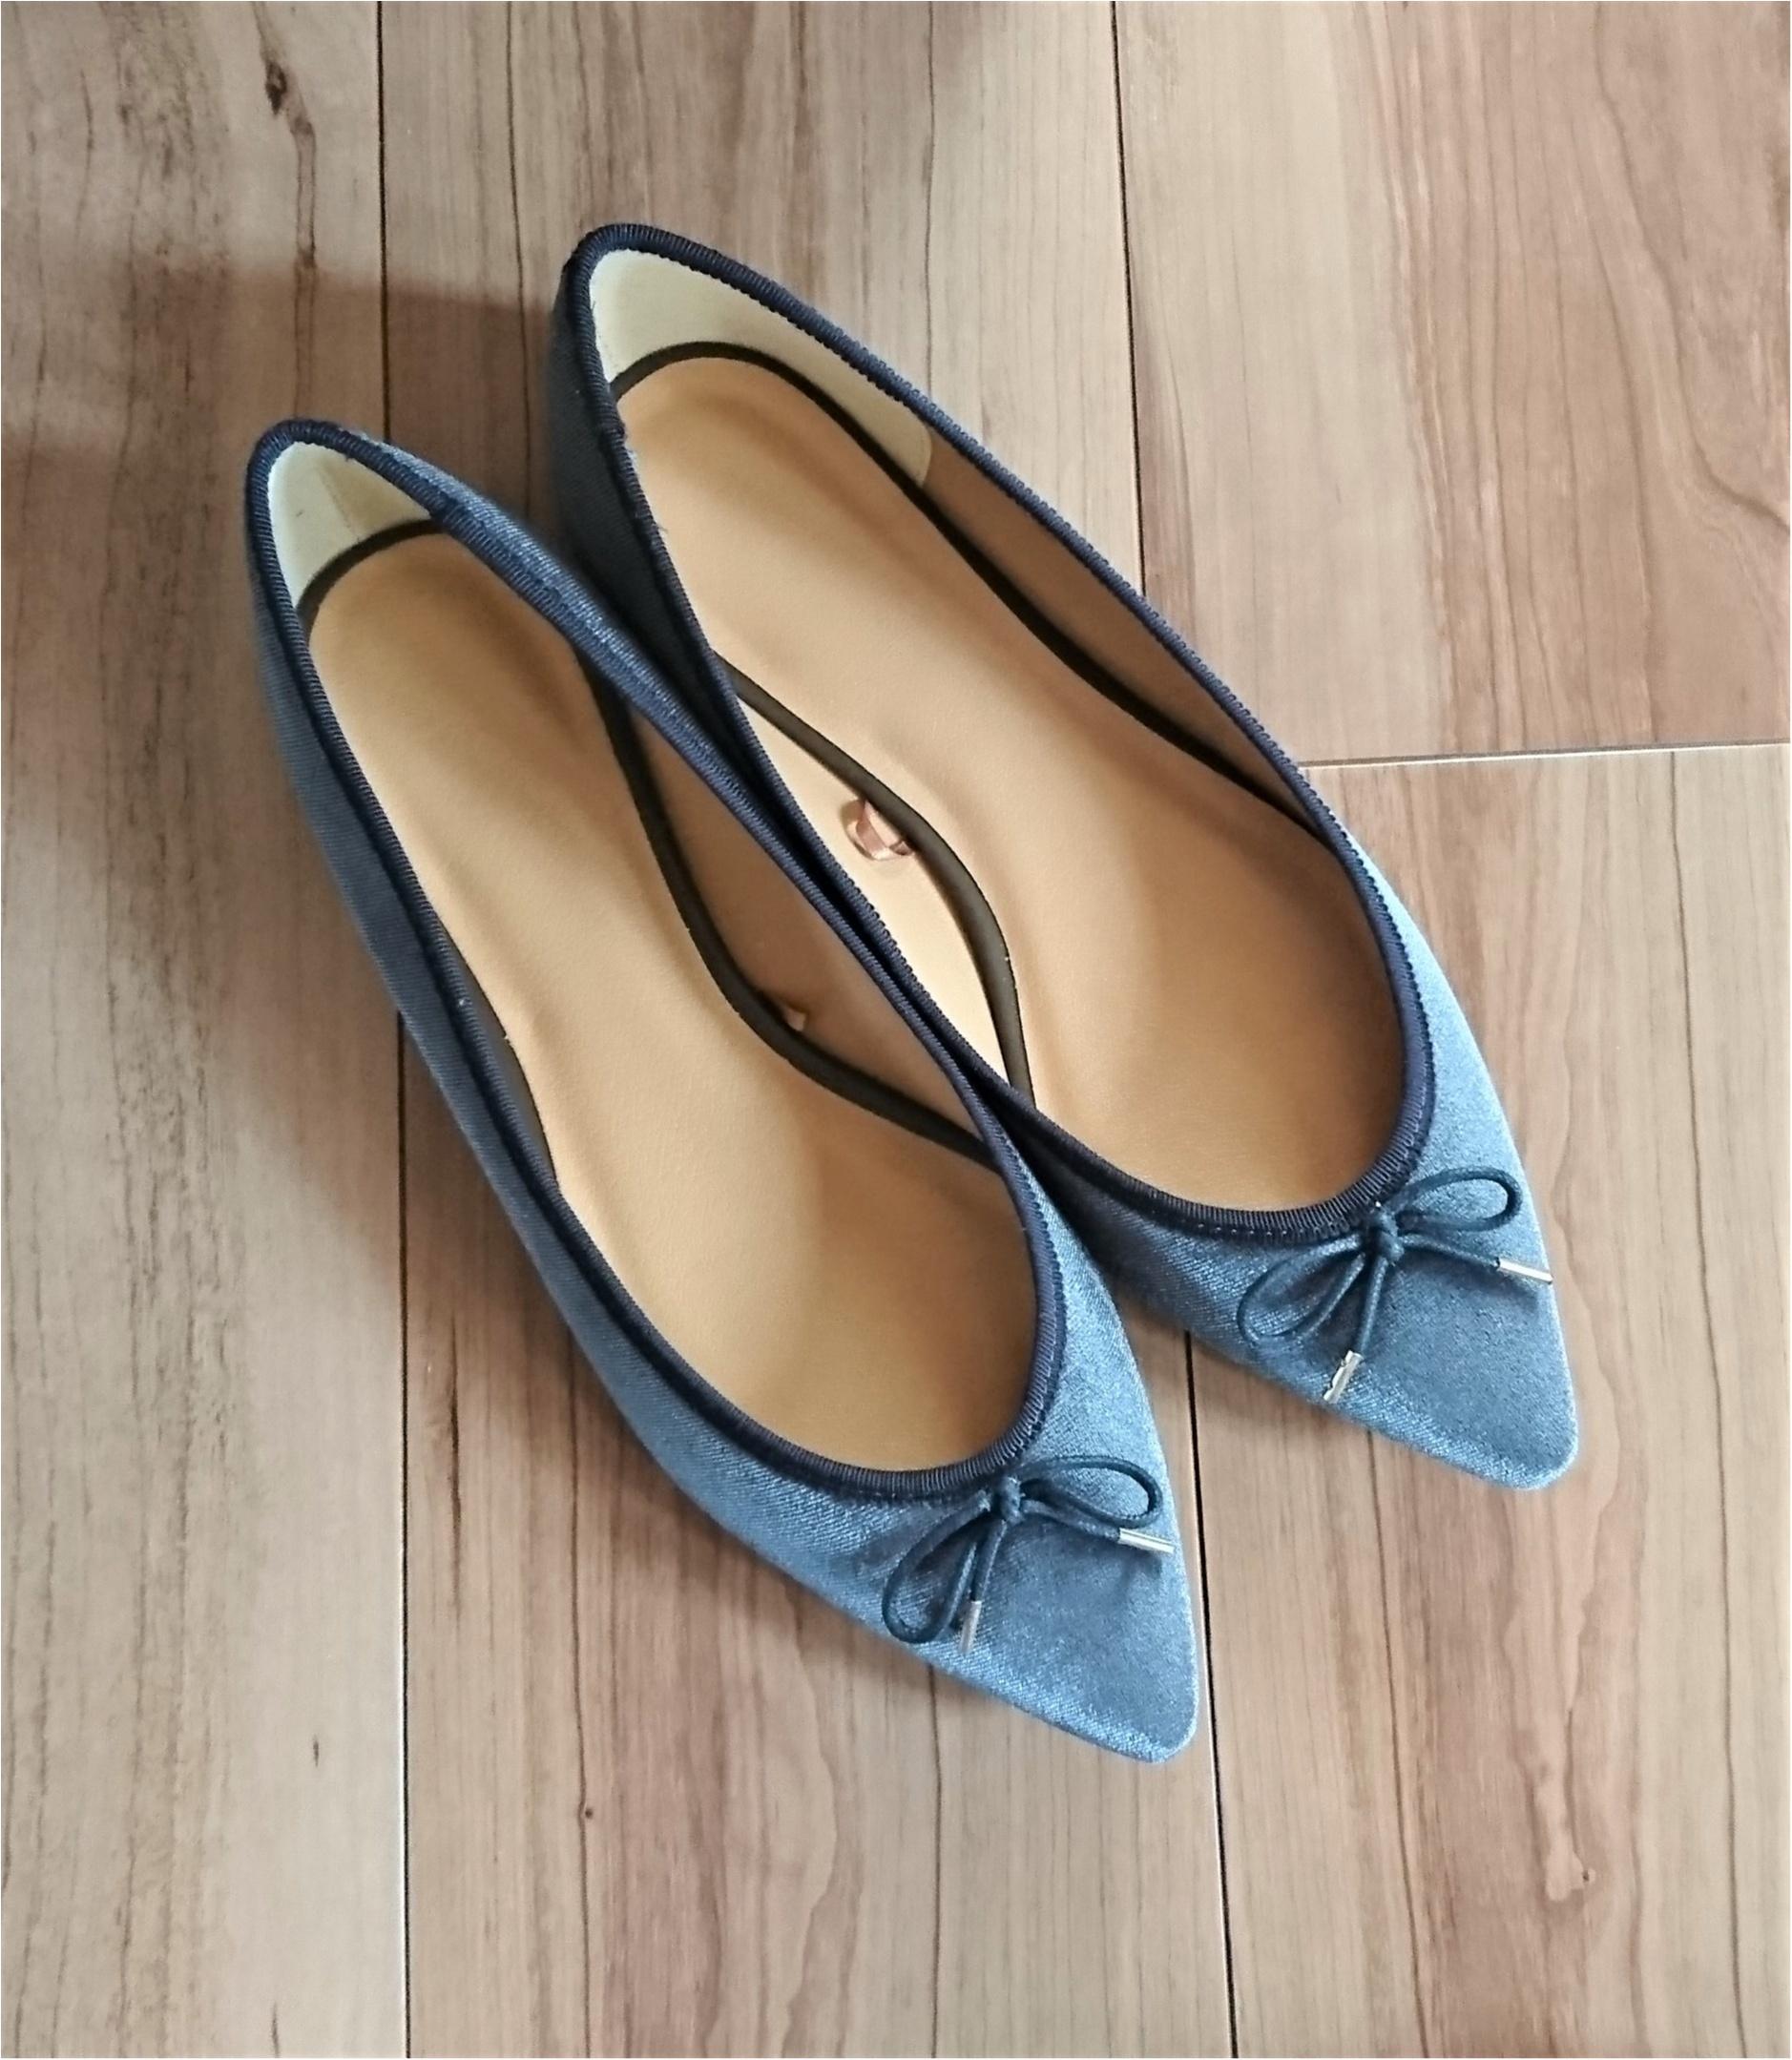 【GUの秋靴】お洒落は足元から♡秋シューズcoordinate!_2